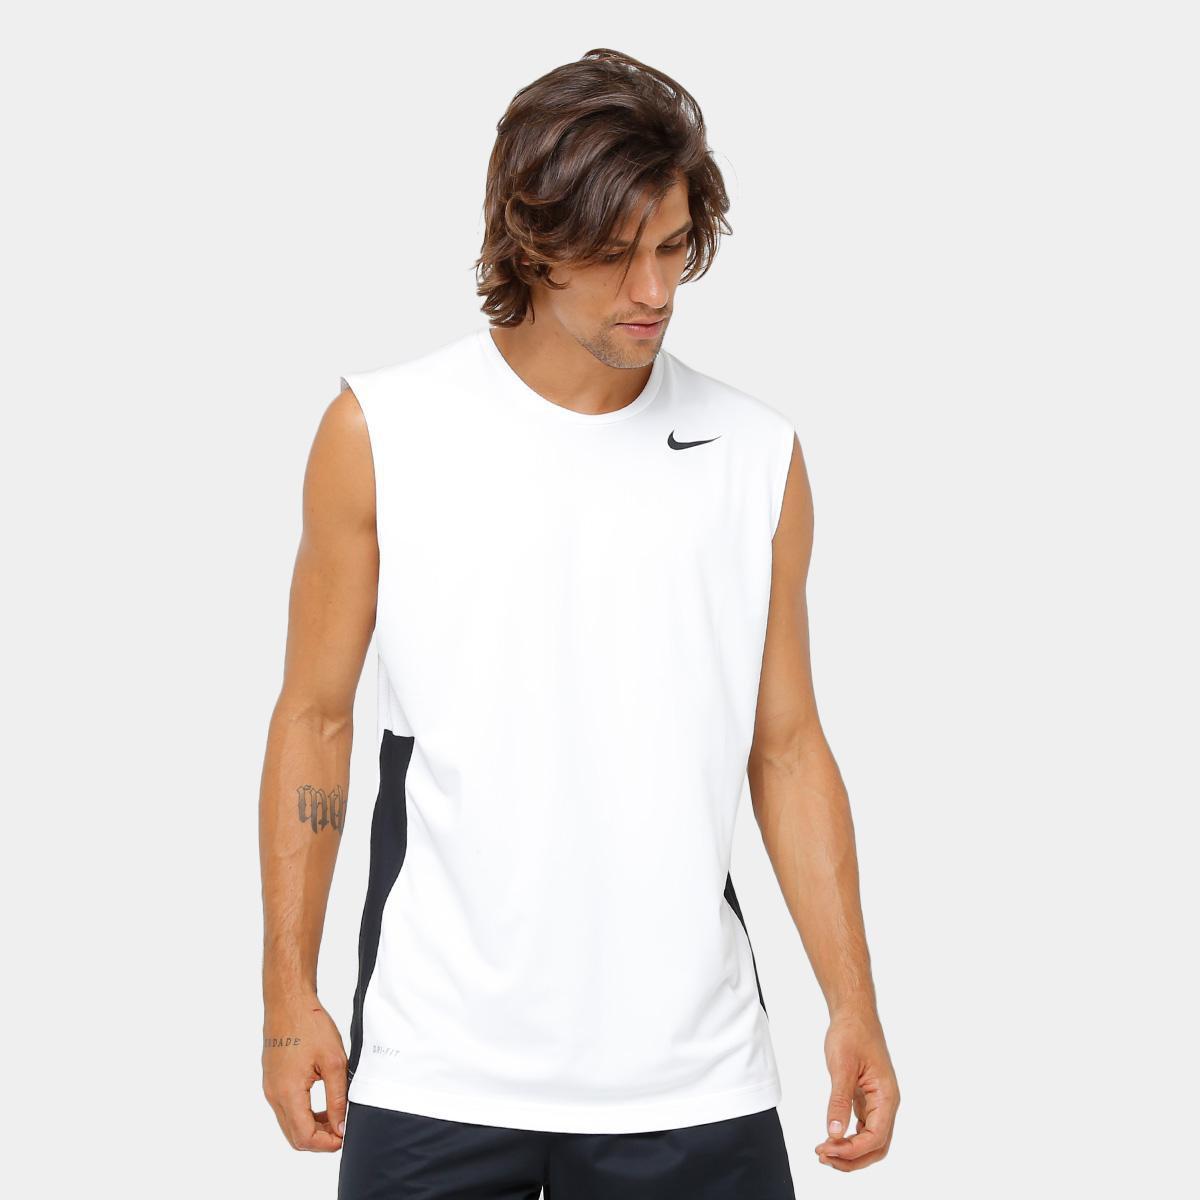 3f6e357818180 Camiseta Regata Nike Crossover Sleeveless - Compre Agora